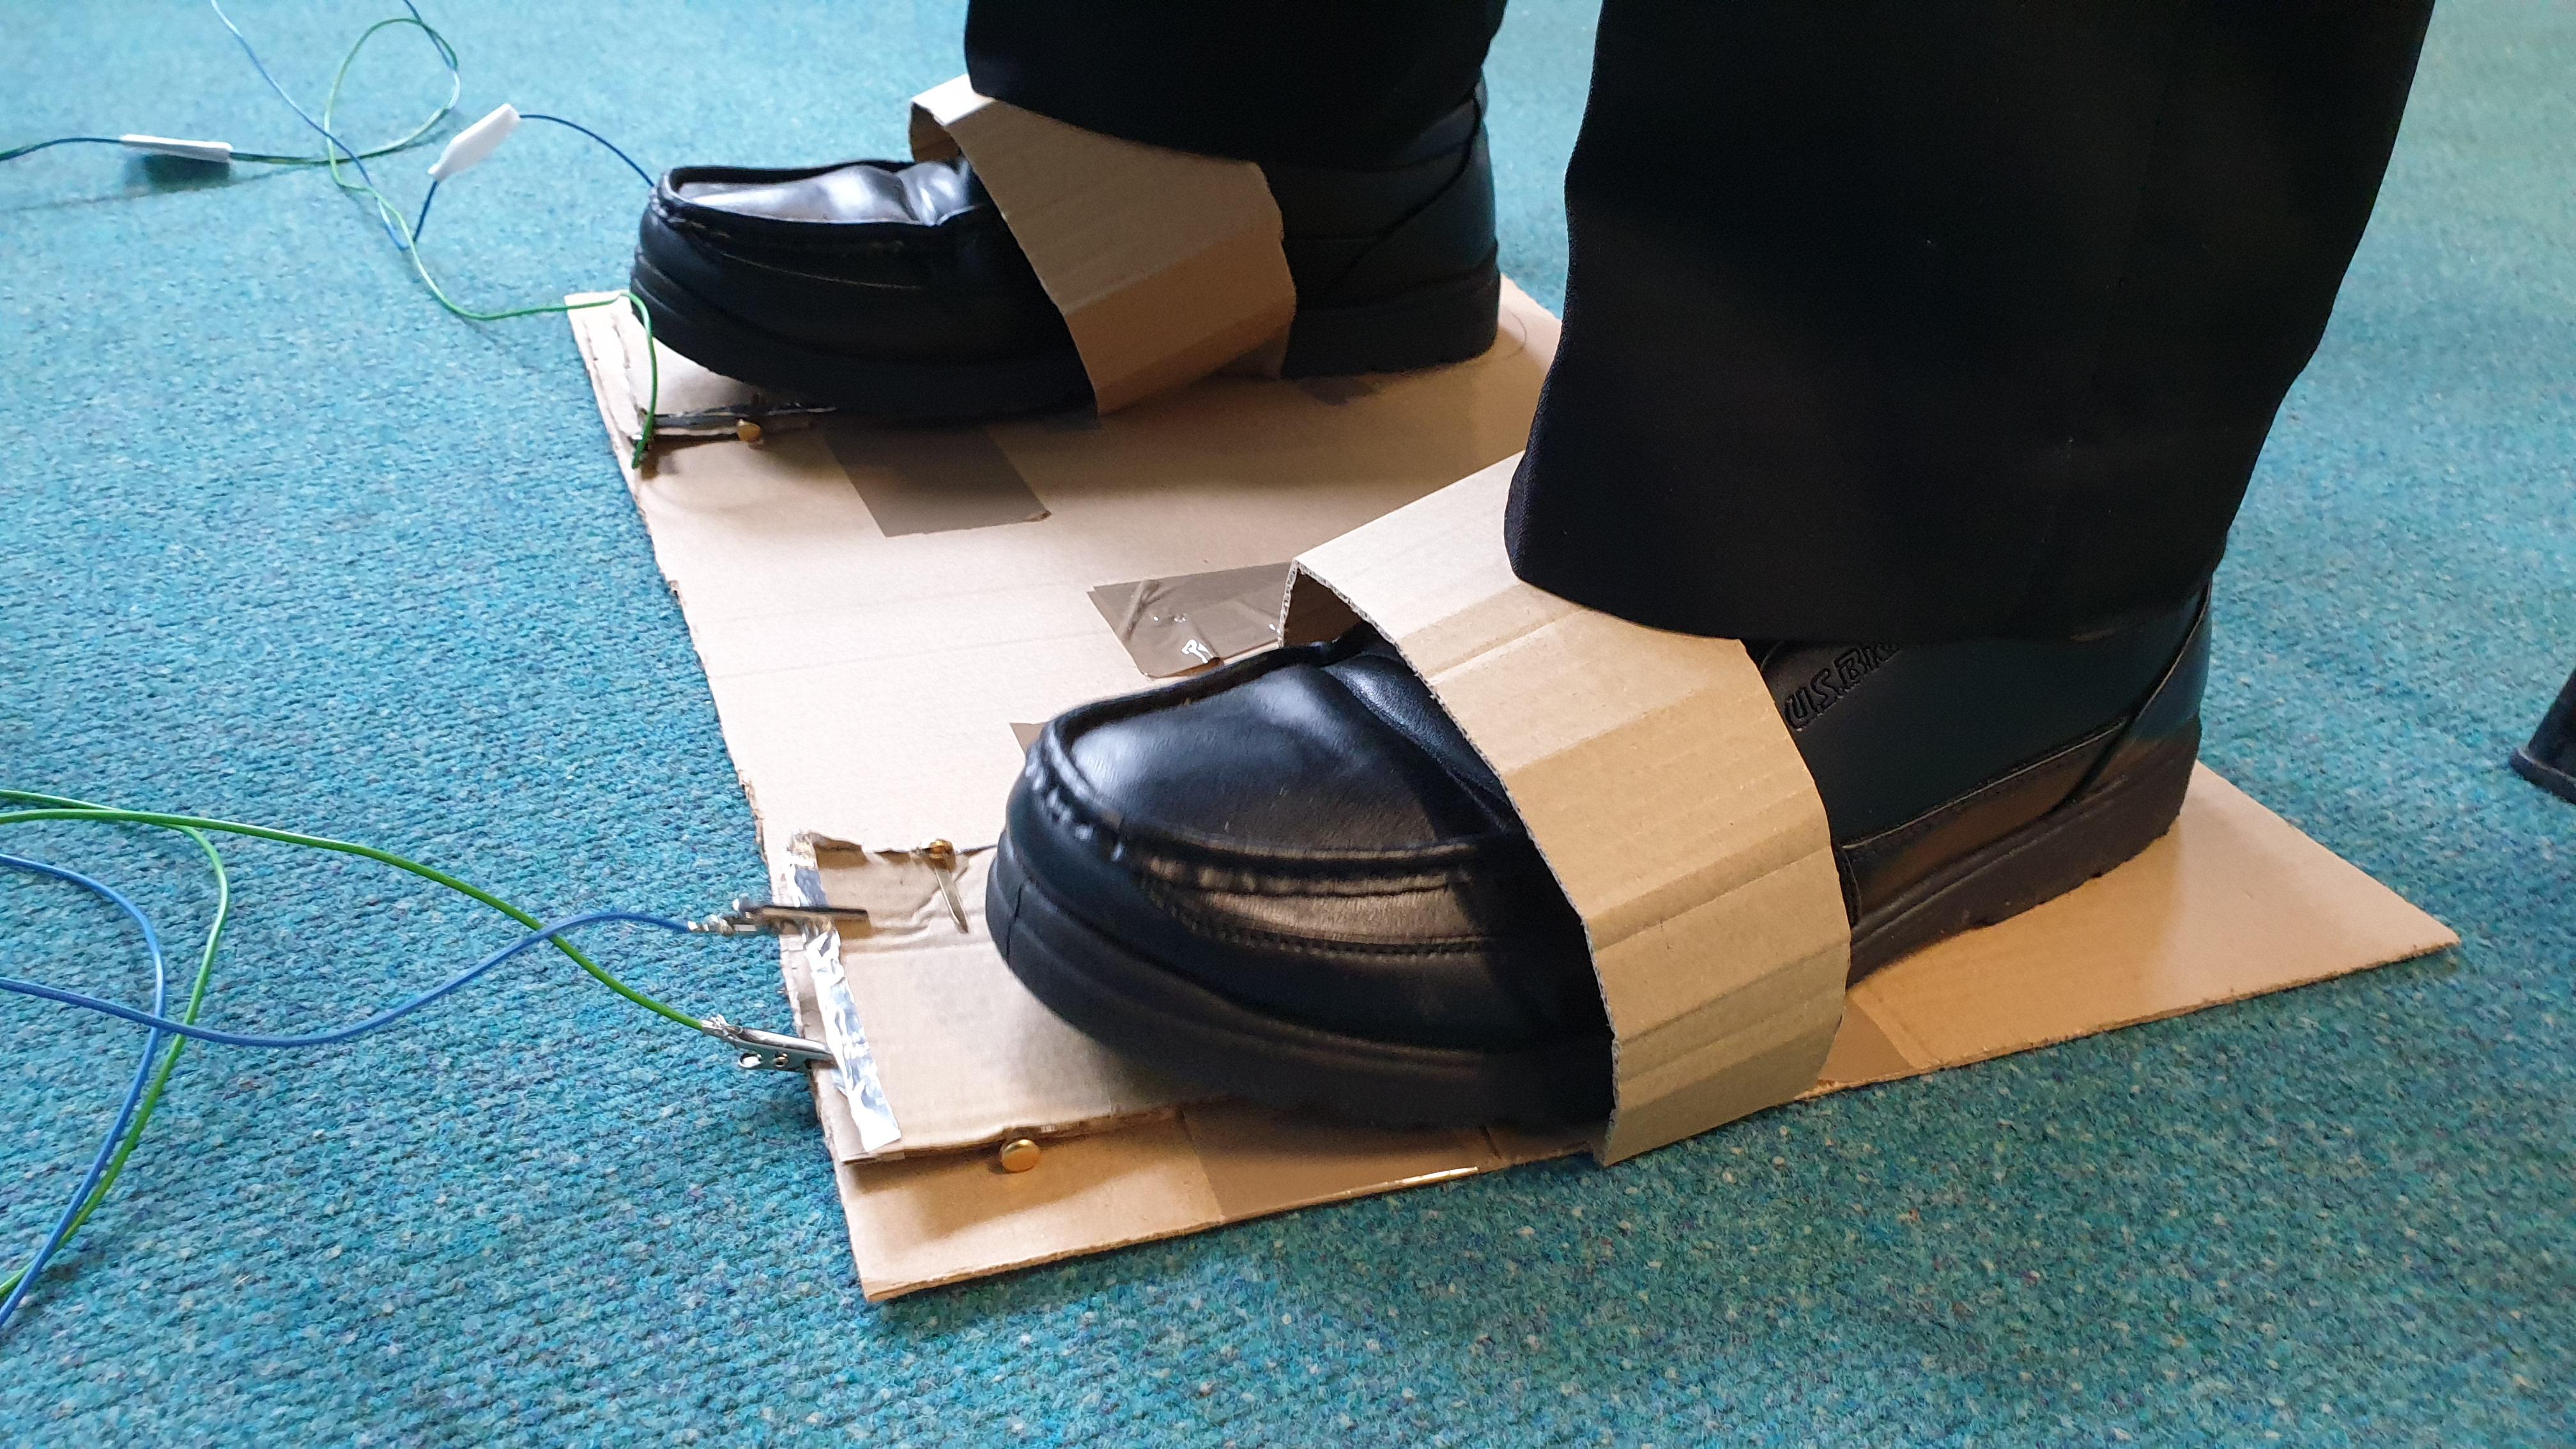 Foot controller